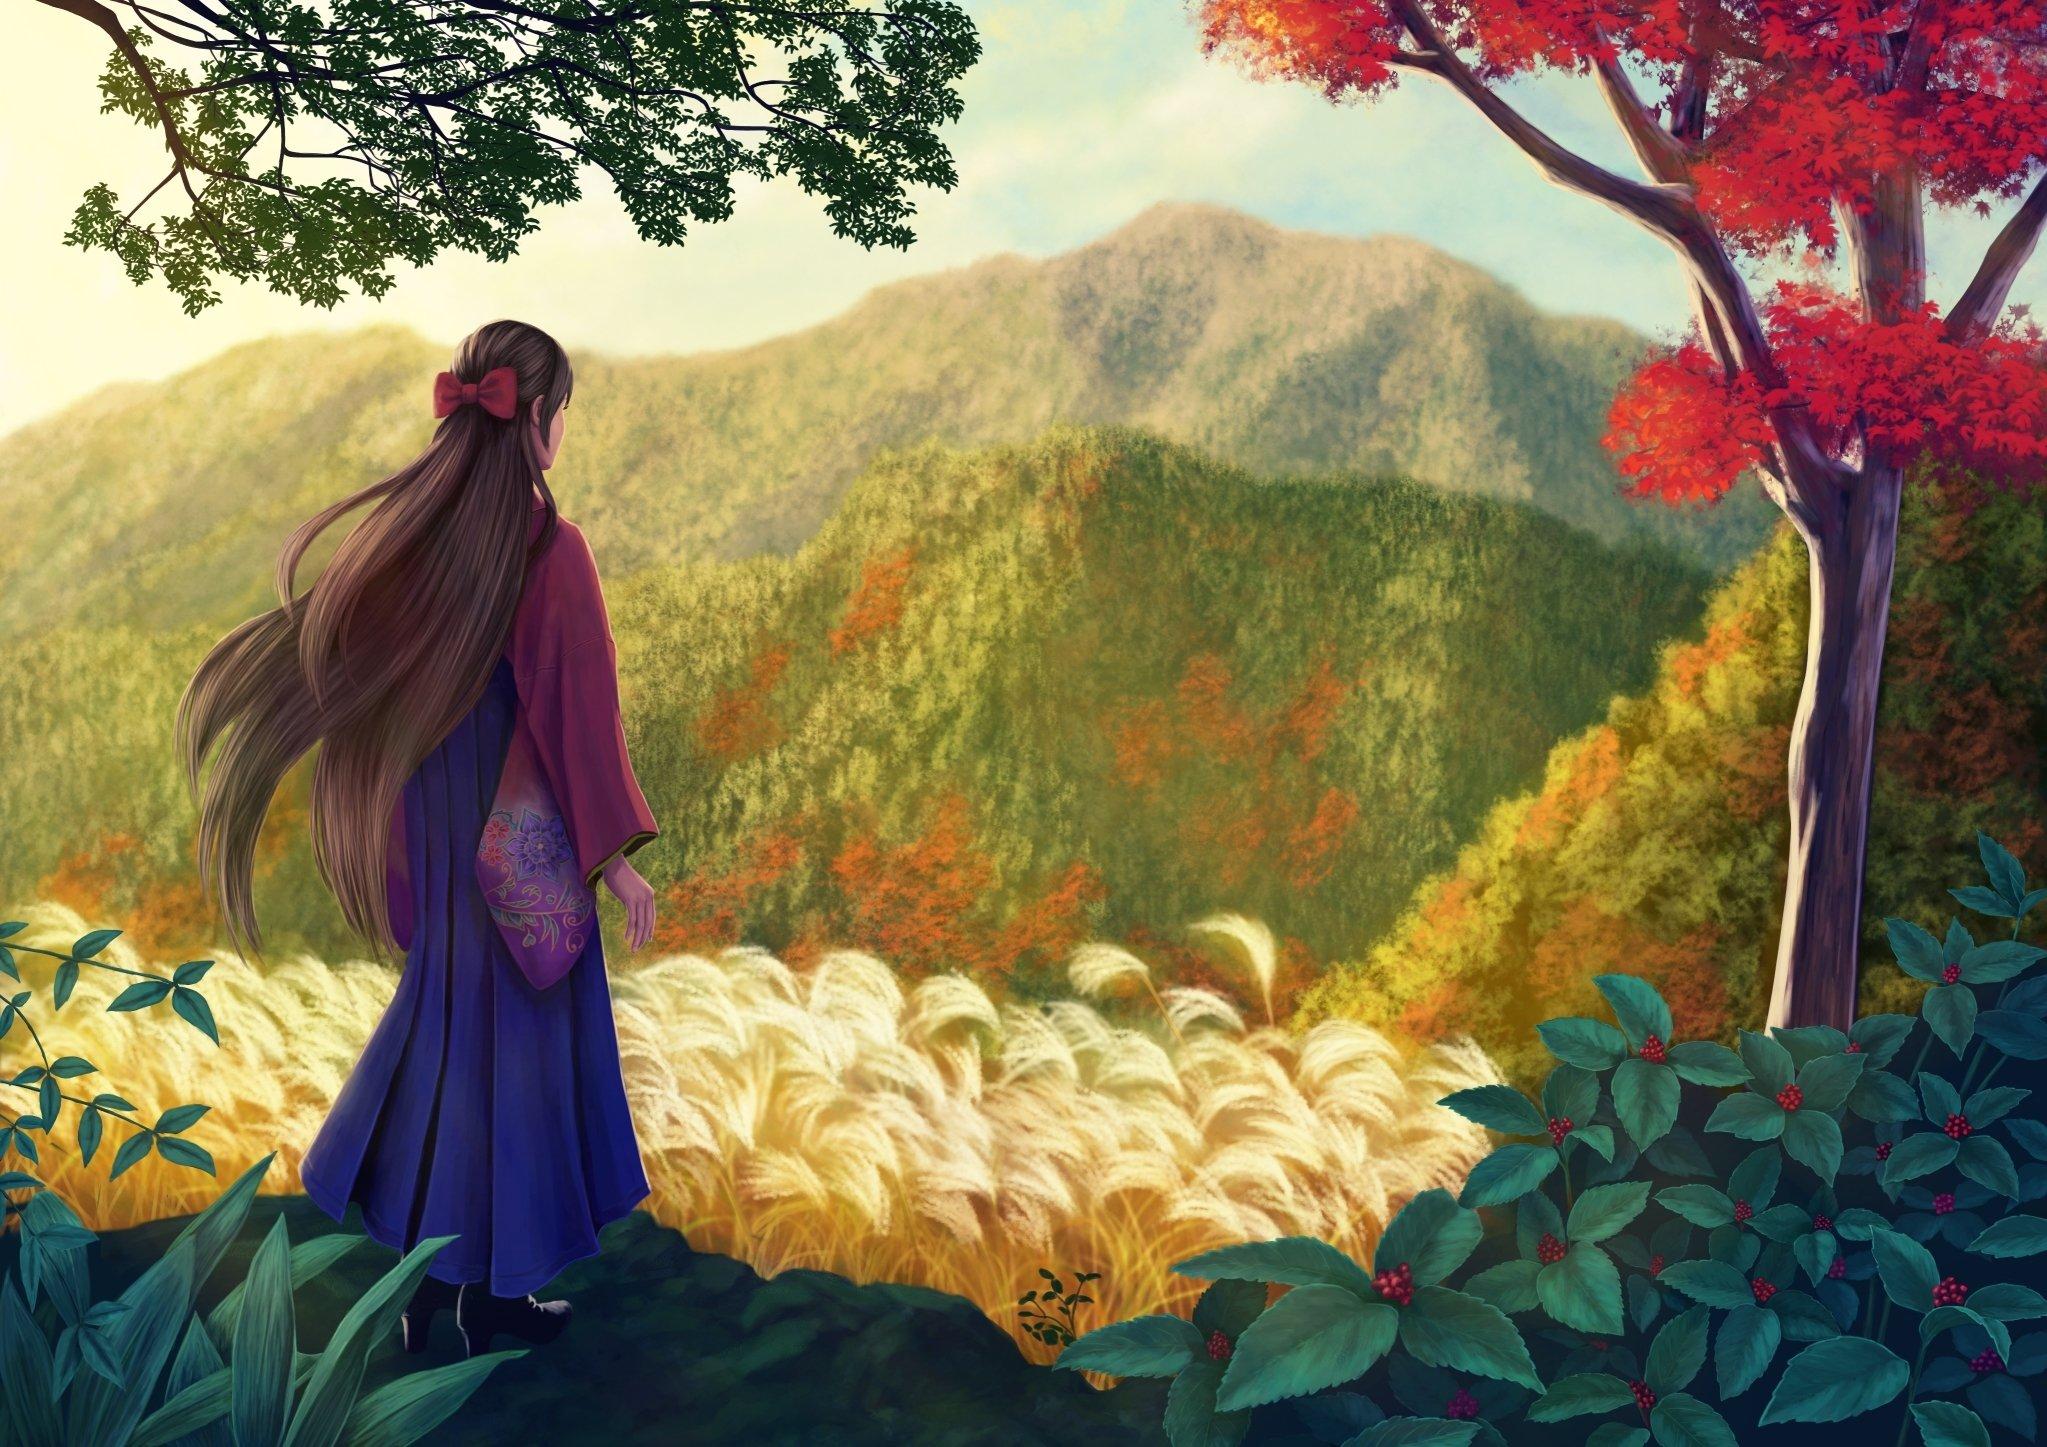 Nature girl red tree flower alone girl kimono mountain painting wallpaper 2047x1447 495575 wallpaperup